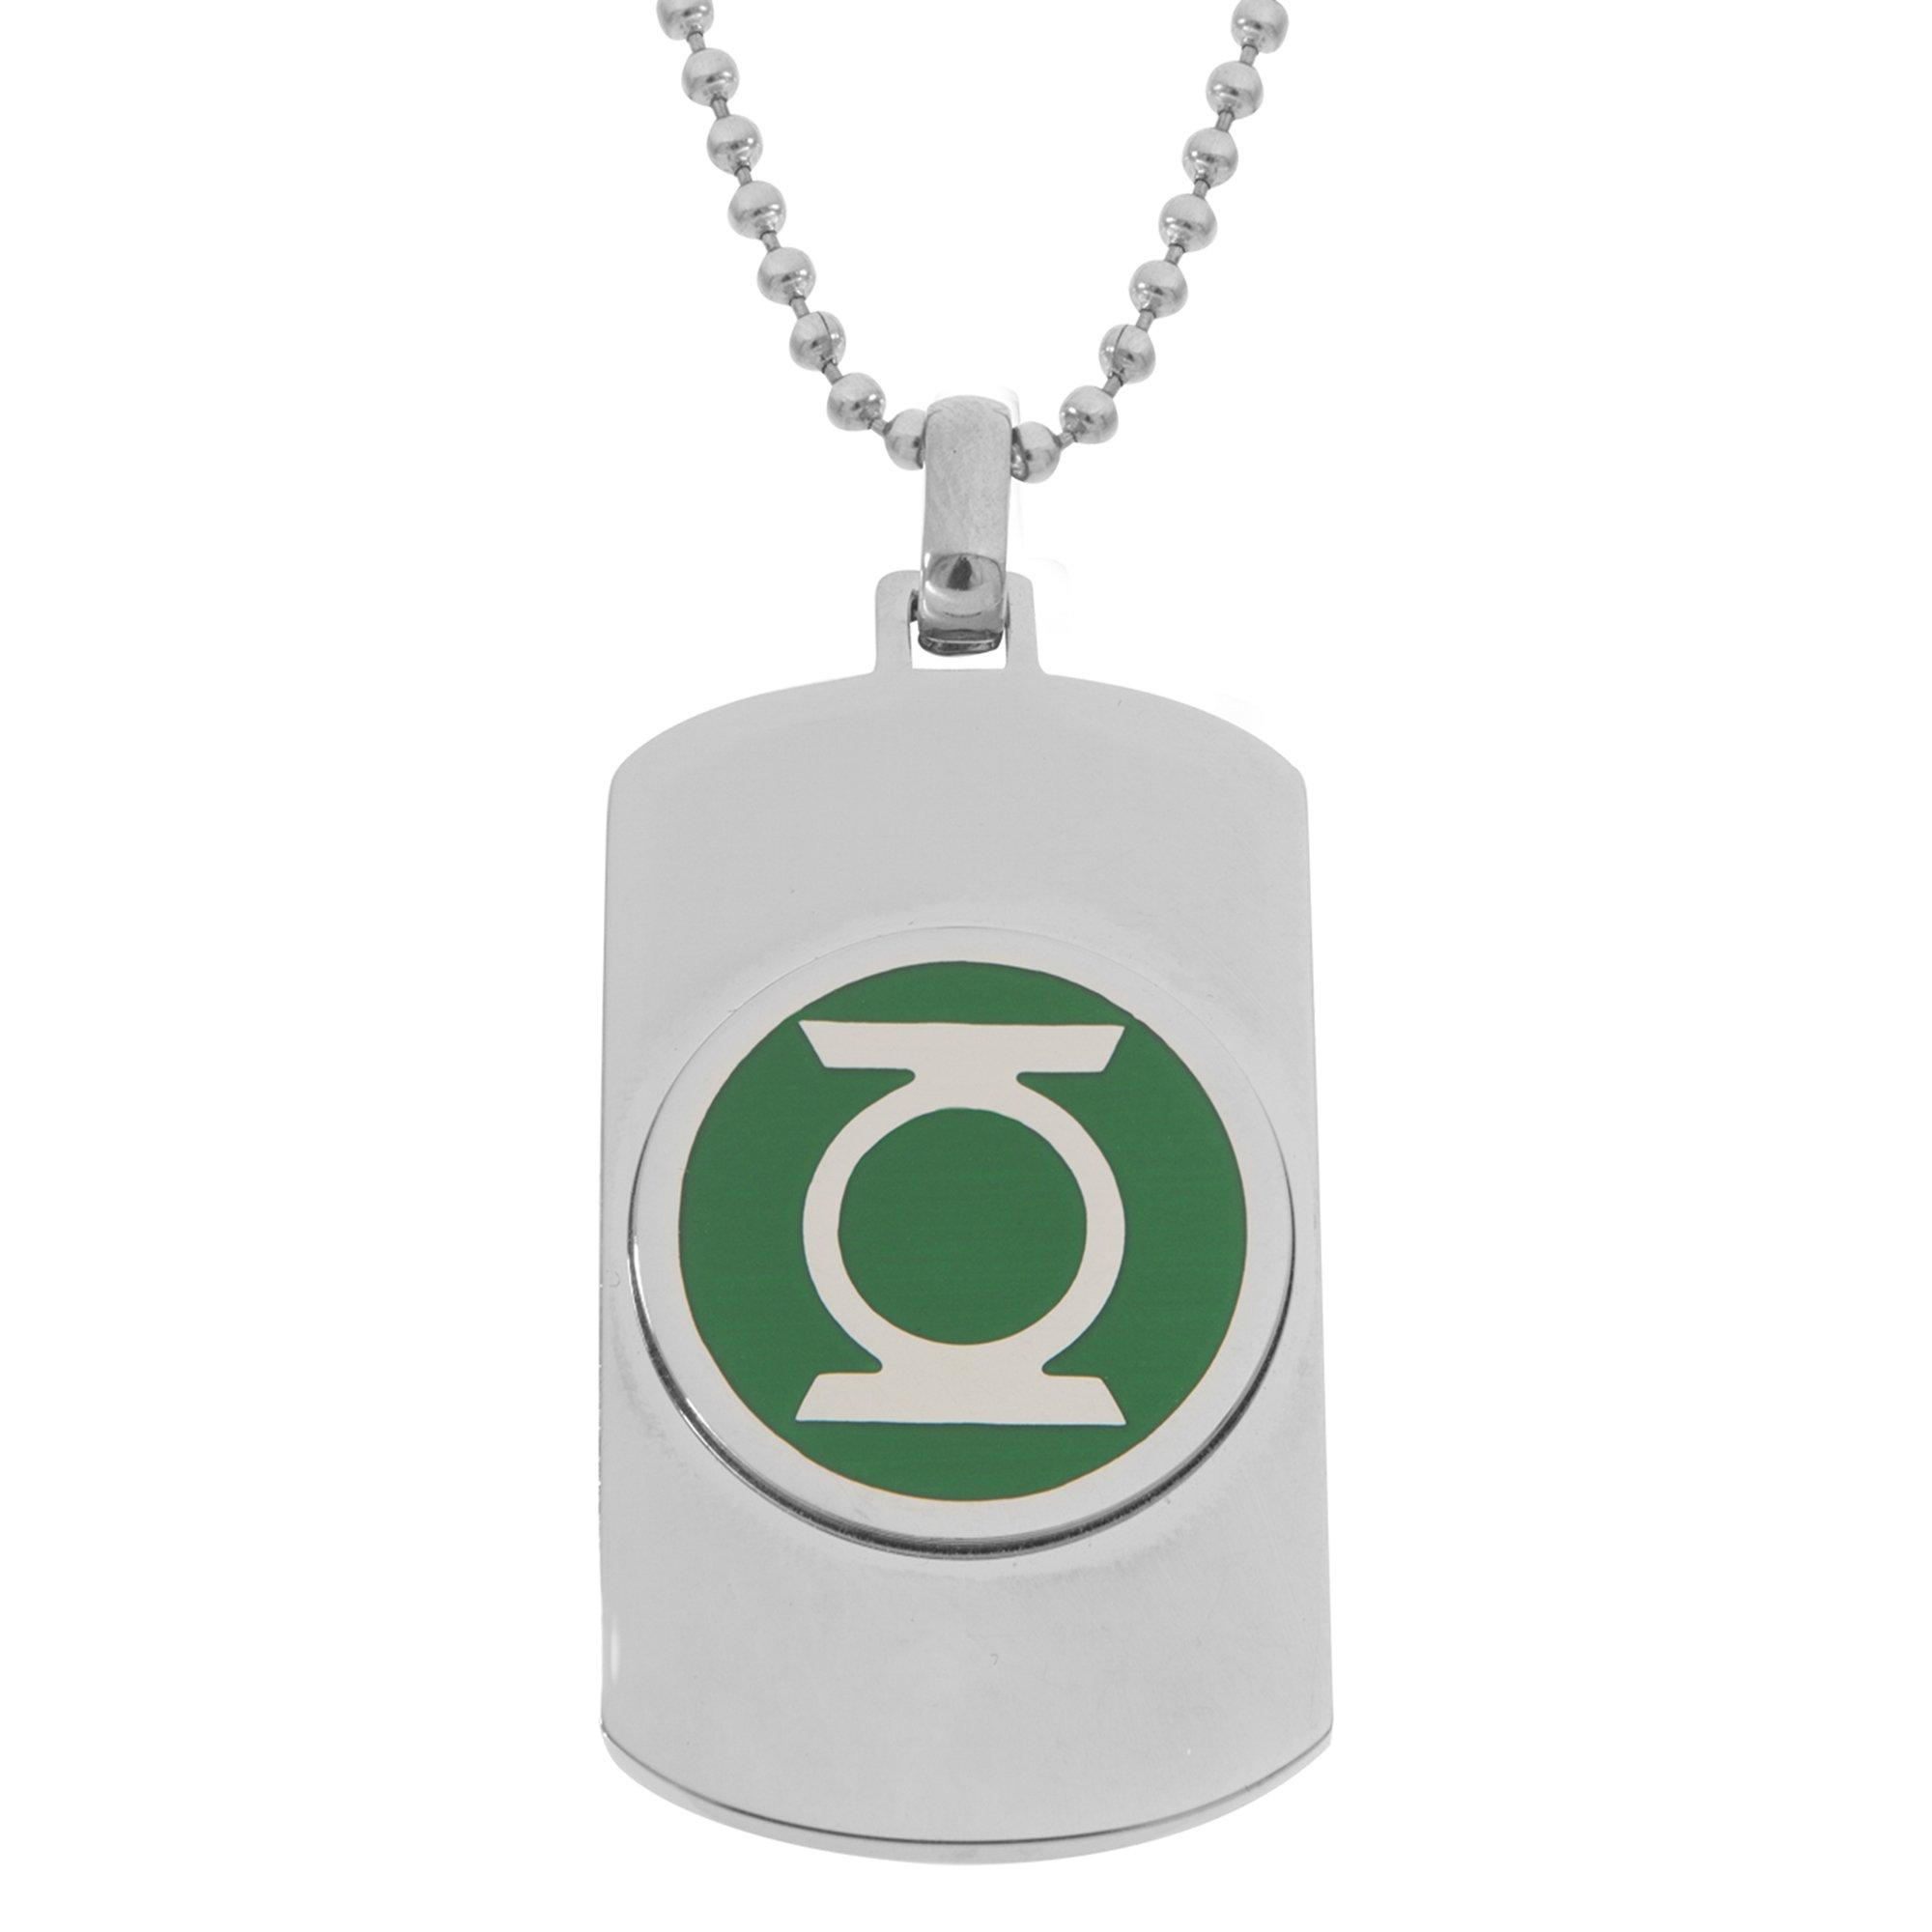 DC Comics Green Lantern Superhero Logo Stainless Steel Dog Tag Pendant Necklace, 22''